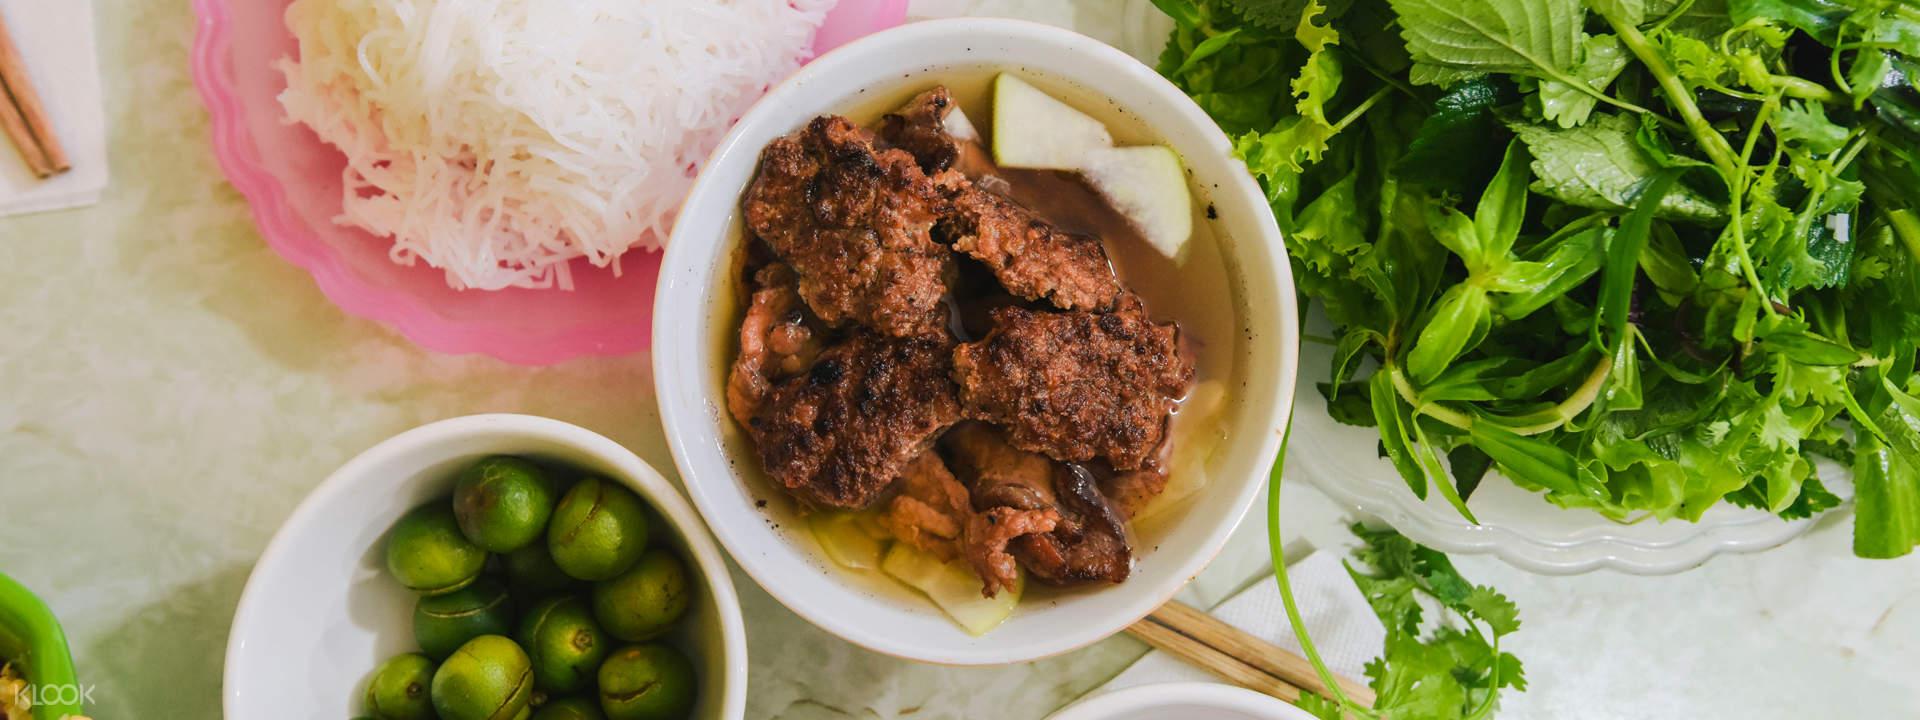 Hanoi Old Quarter Food Tour - Klook